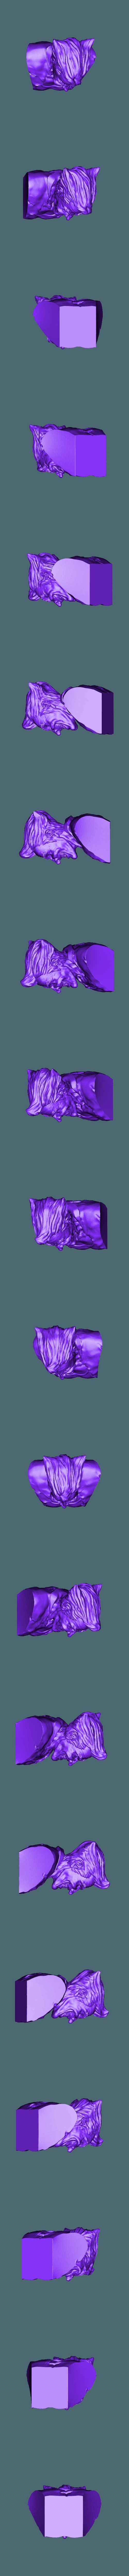 Joker.stl Download STL file 5 in 1 • 3D printer model, PorcSkulpt9